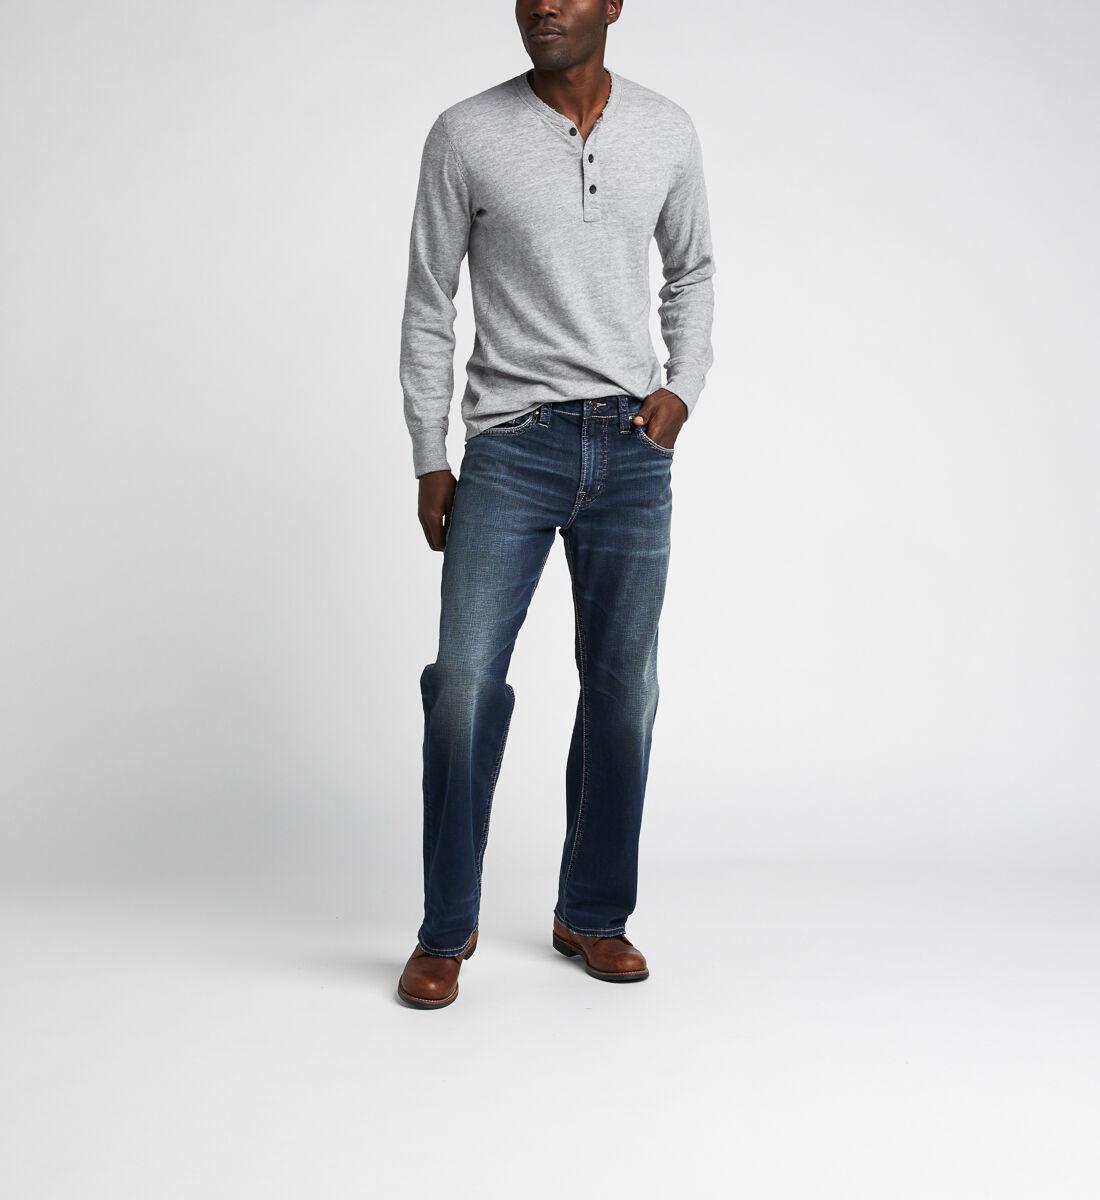 Gordie Loose Fit Straight Jeans,Indigo Front